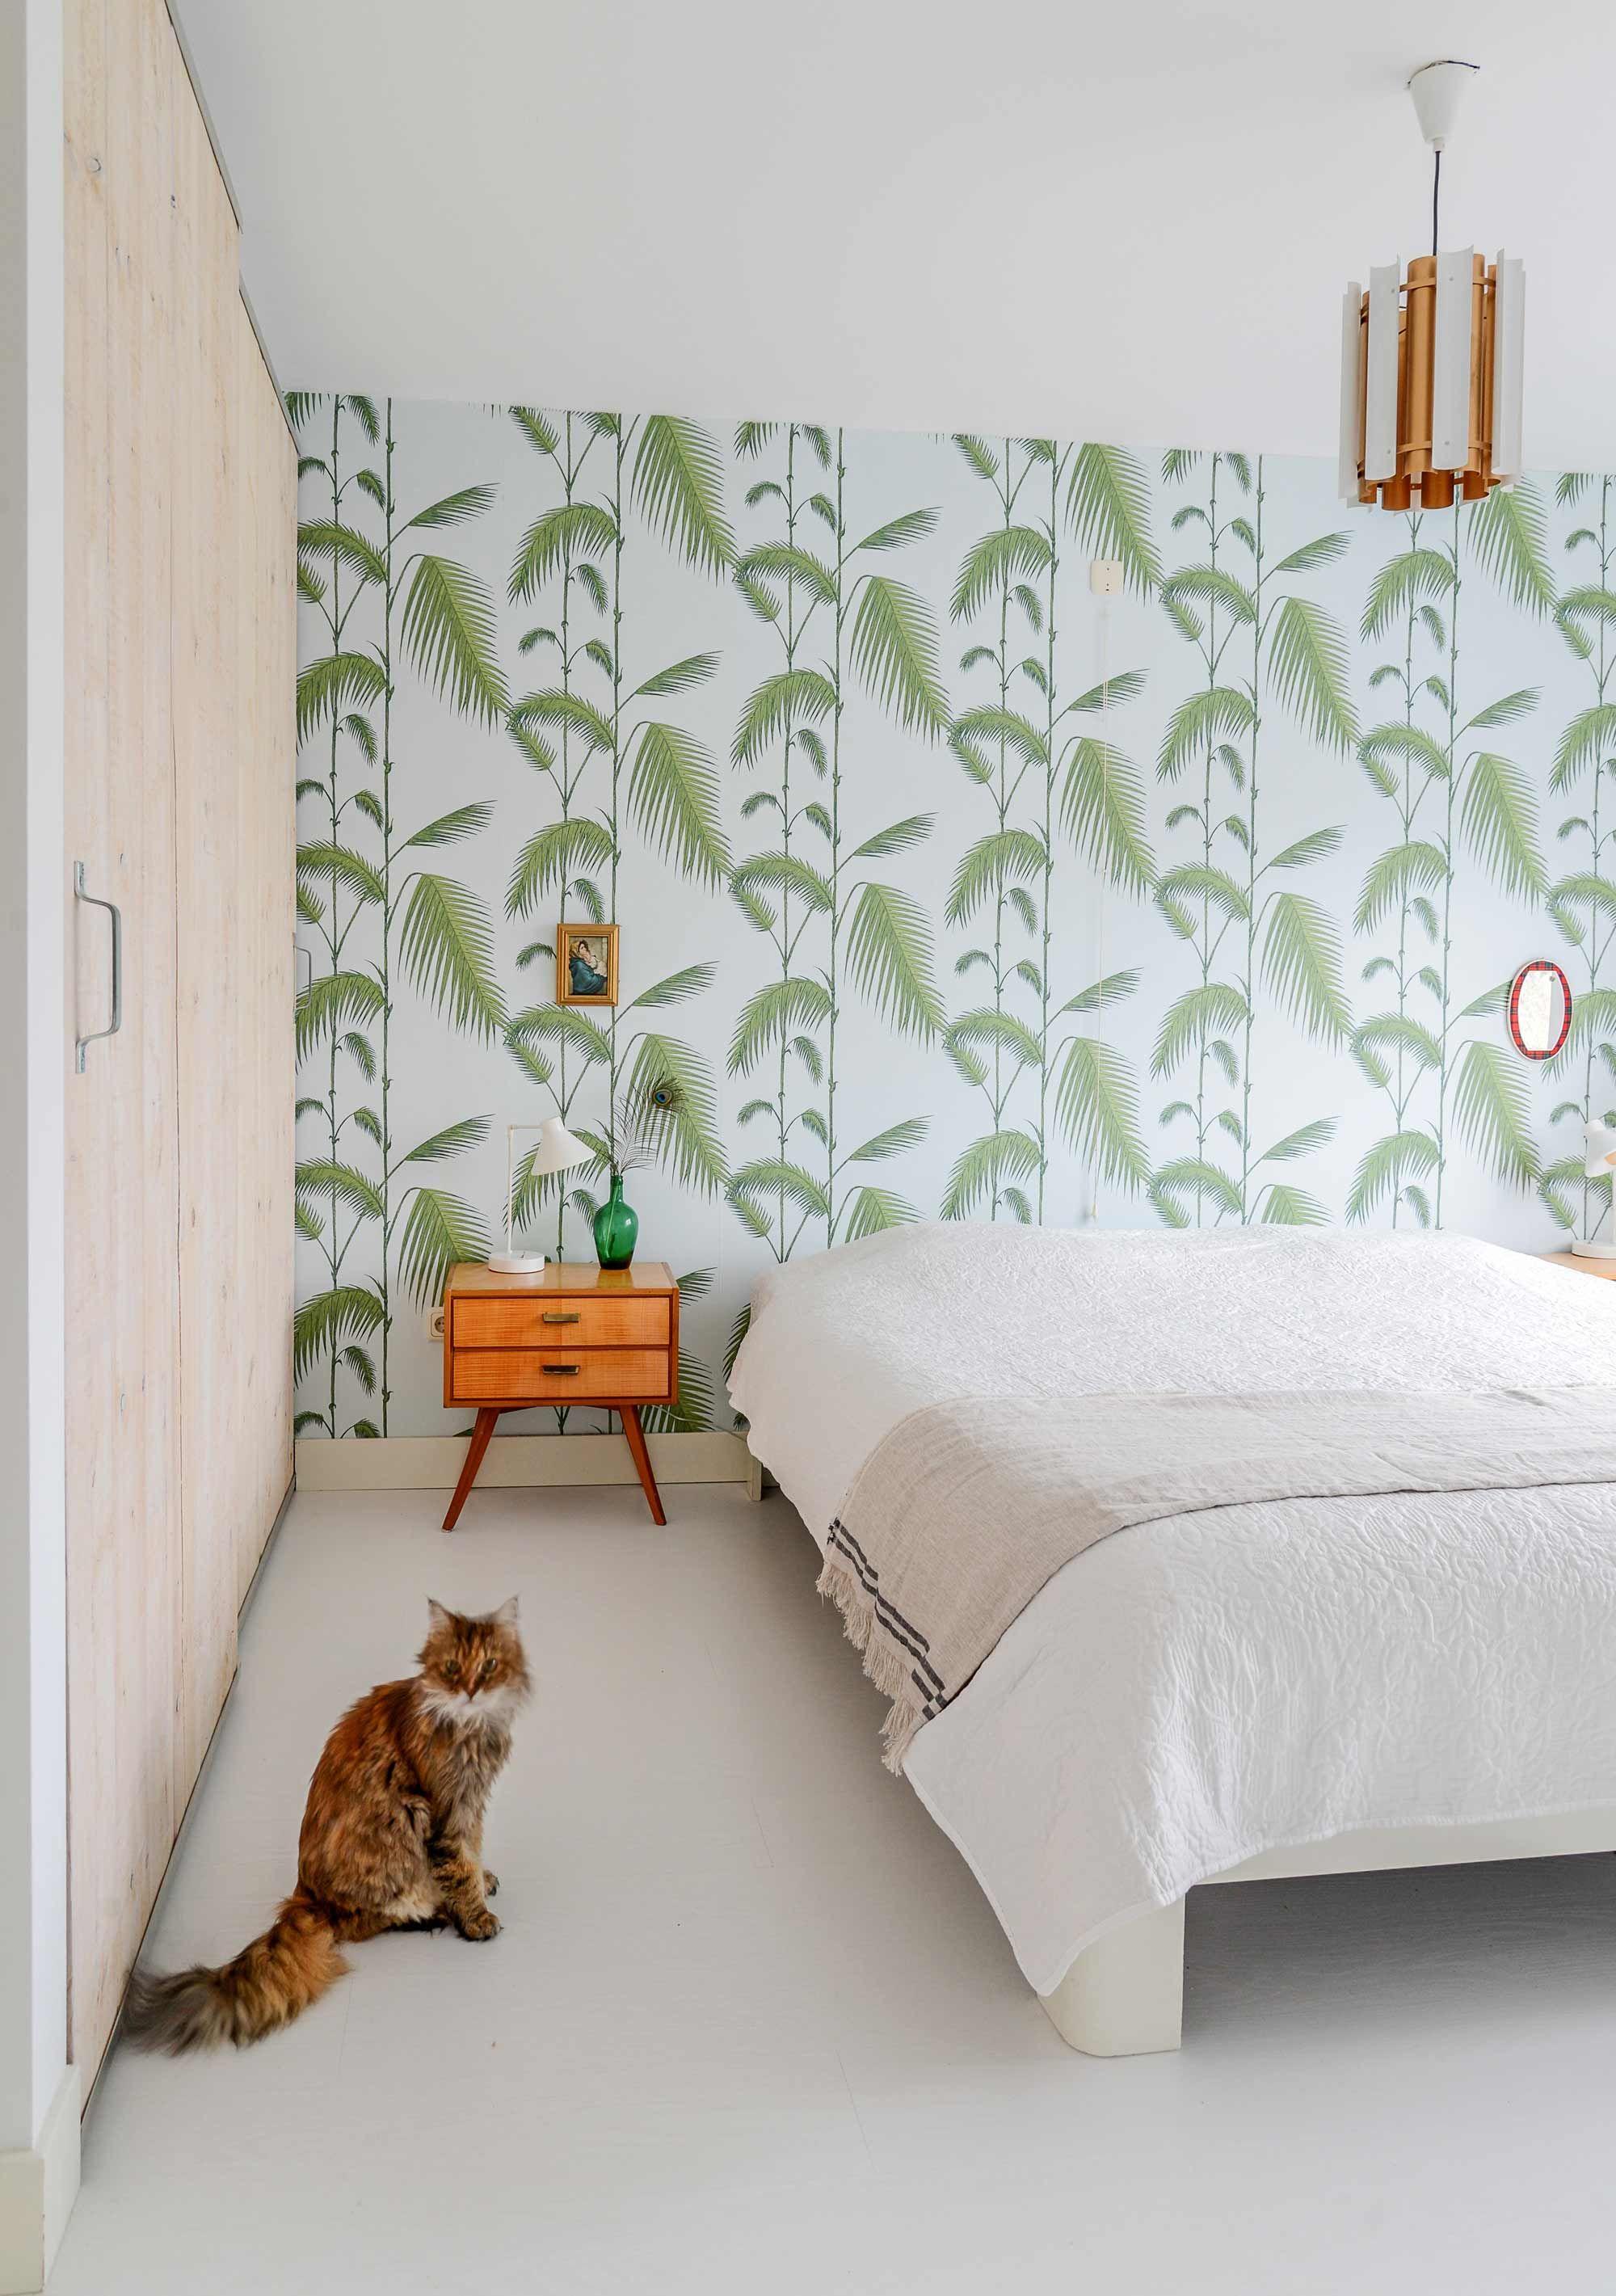 Groen behang slaapkamer  For the Home  Verf behang